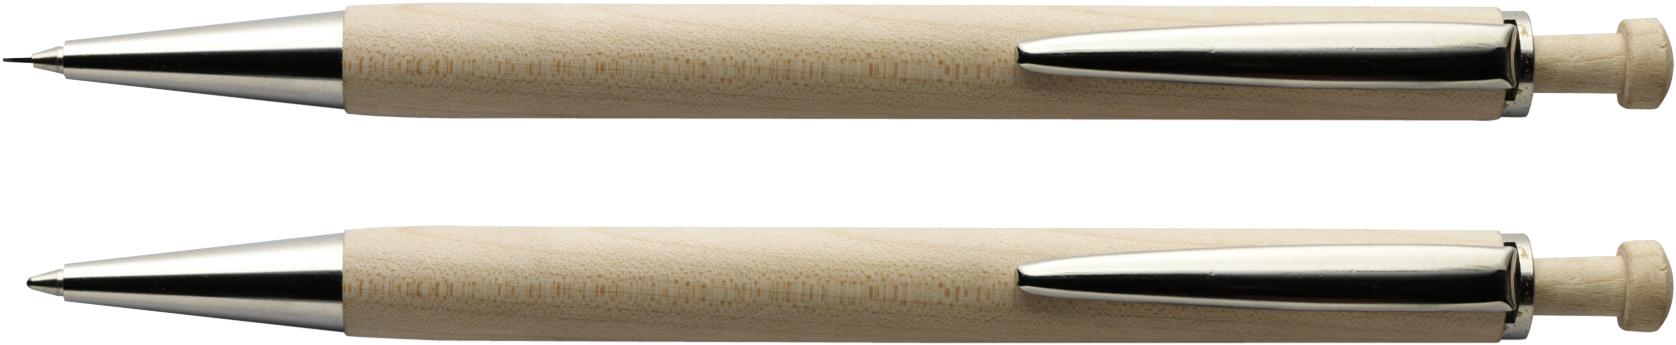 Promotional Wooden pen set